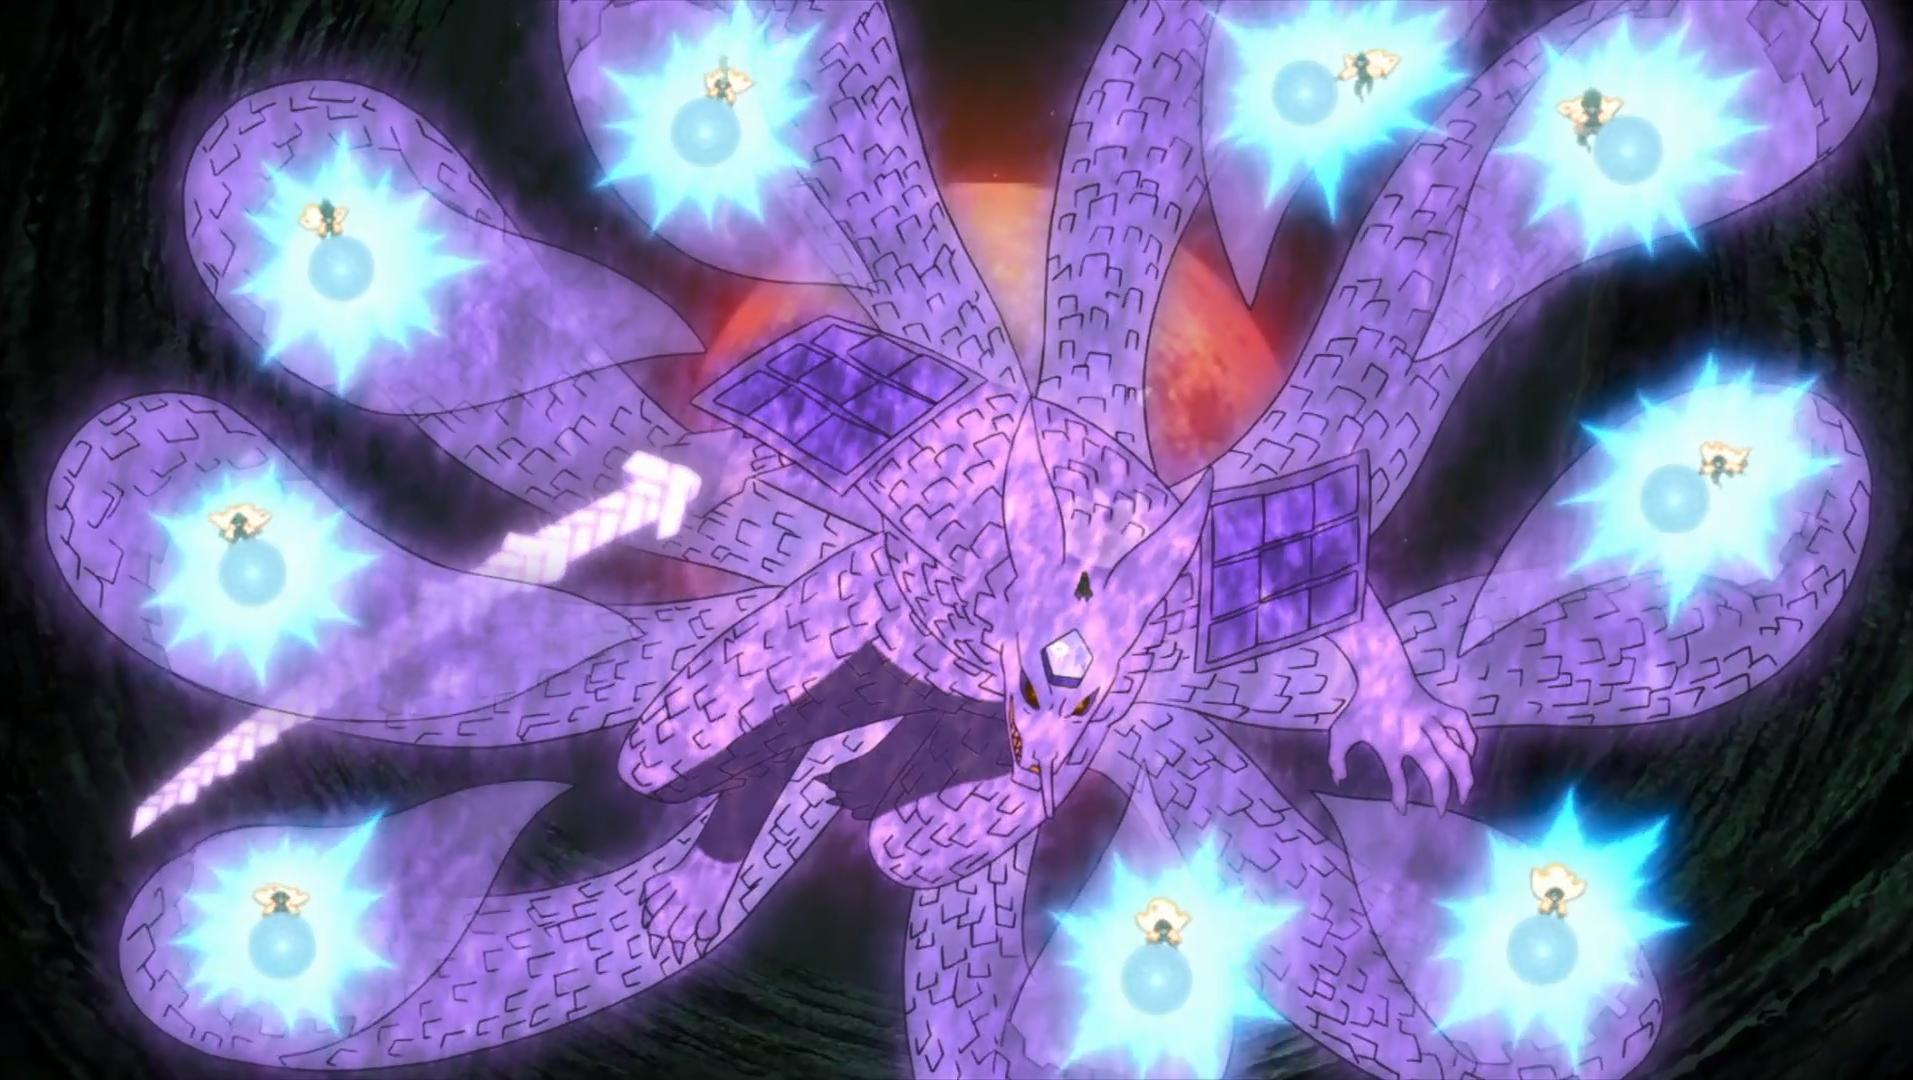 Uzumaki Naruto Kyuubi Mode Line Art 430761901 additionally My Top 5 Naruto Forms further Shippuden Sasuke Demon likewise Sage Naruto 208786424 likewise Rasengan. on naruto nine tailed fox rasengan